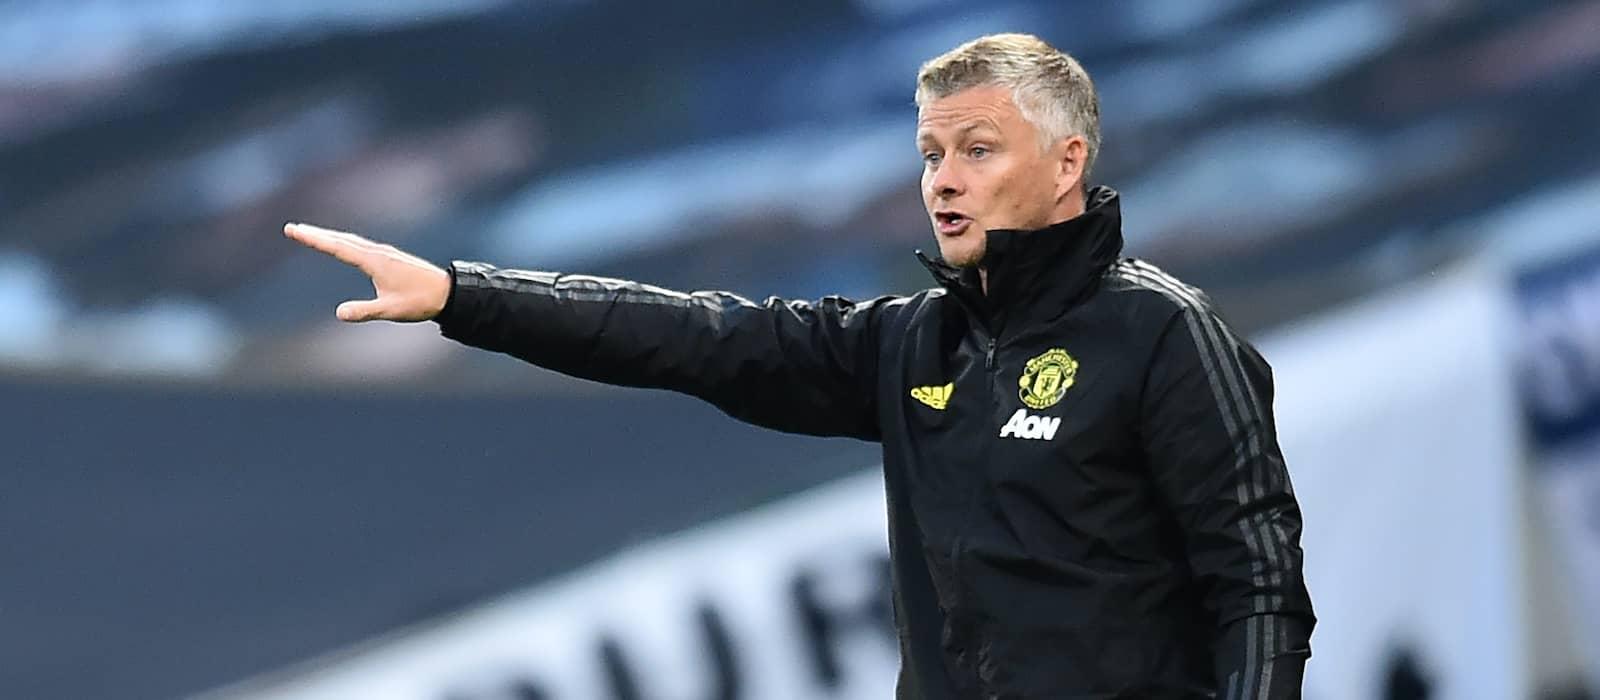 Ole Gunnar Solskjaer discusses Manchester United's good form